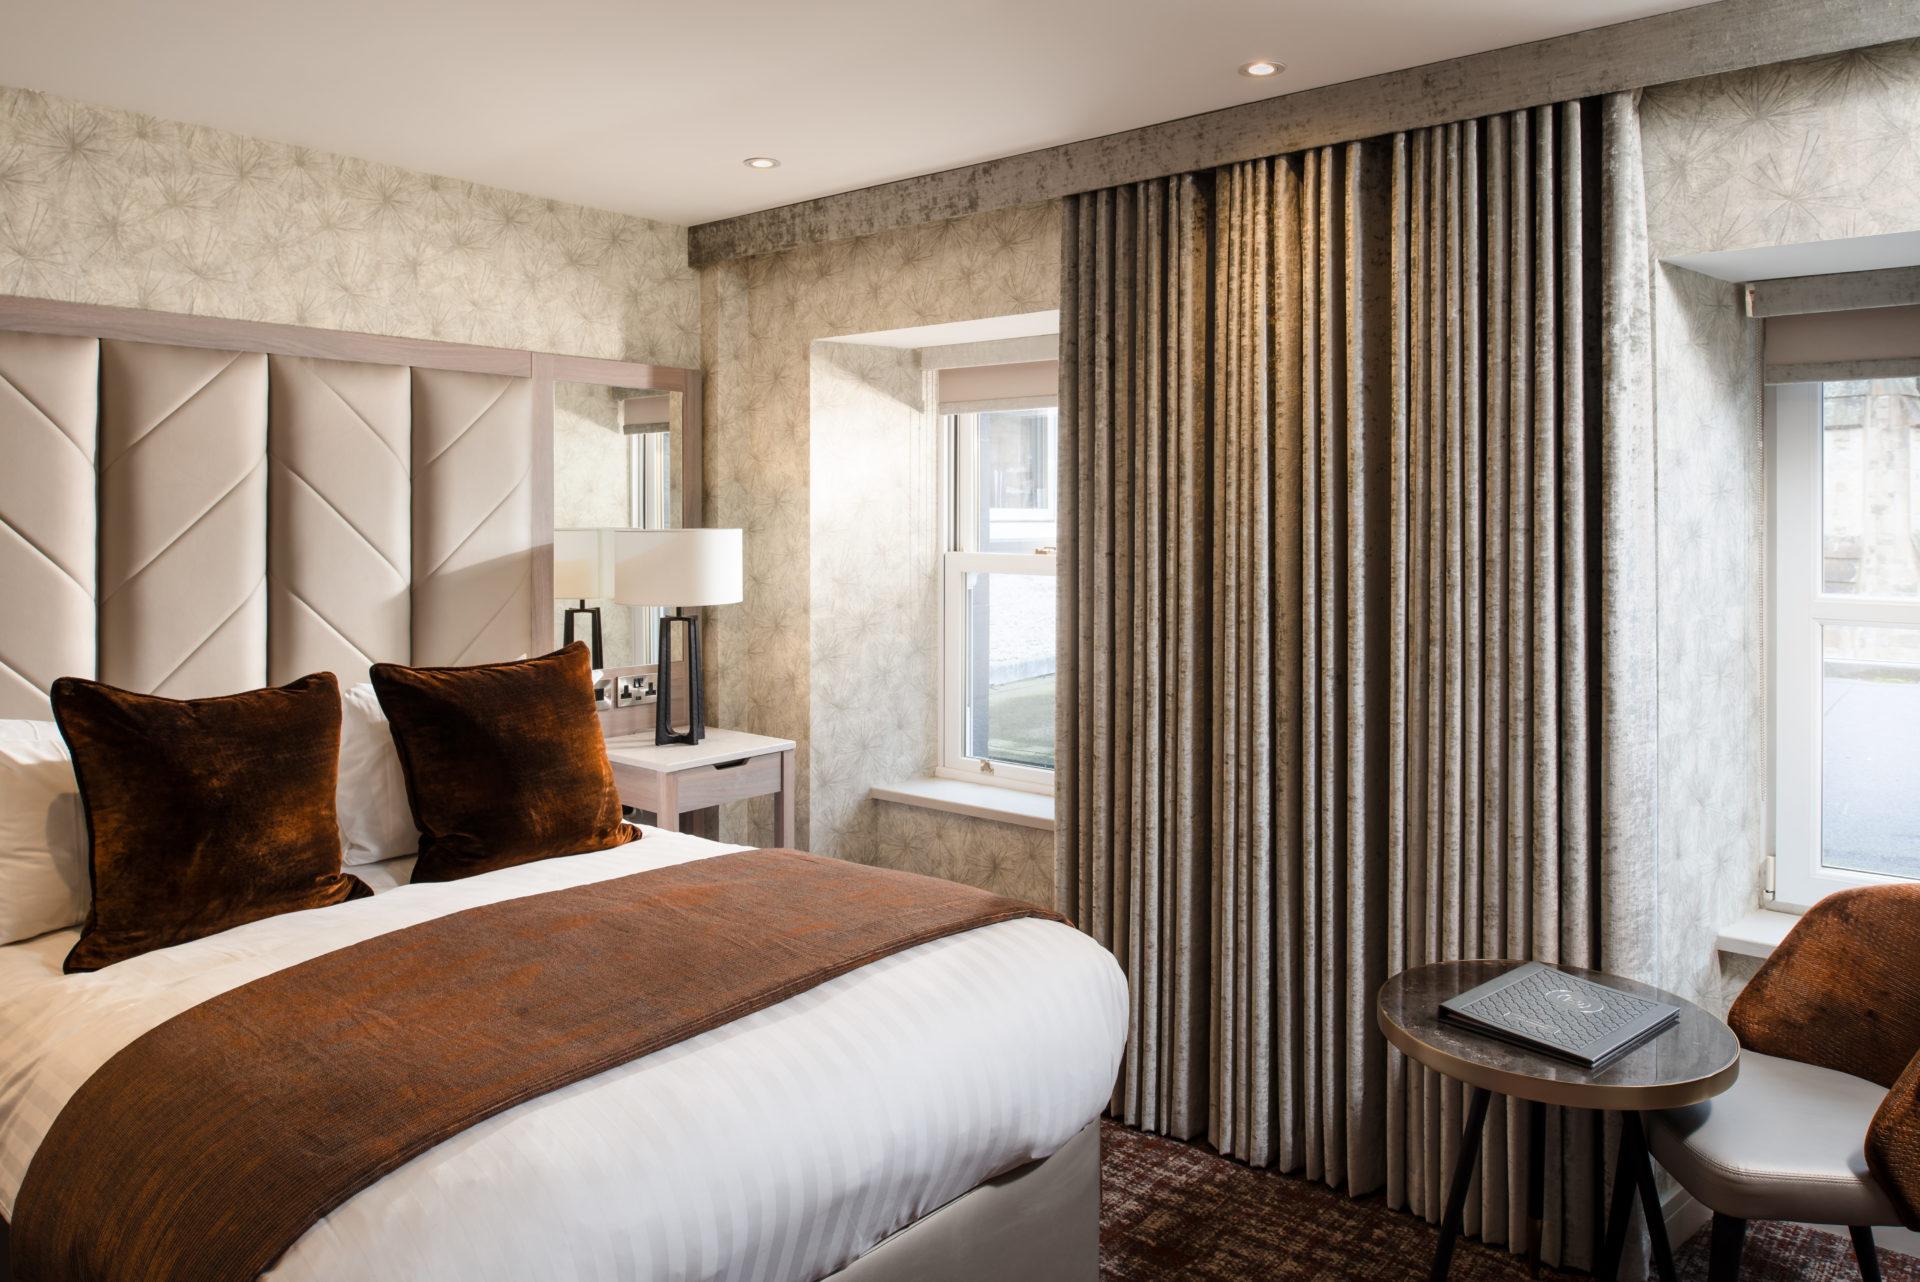 Royal Hotel Bedrooms